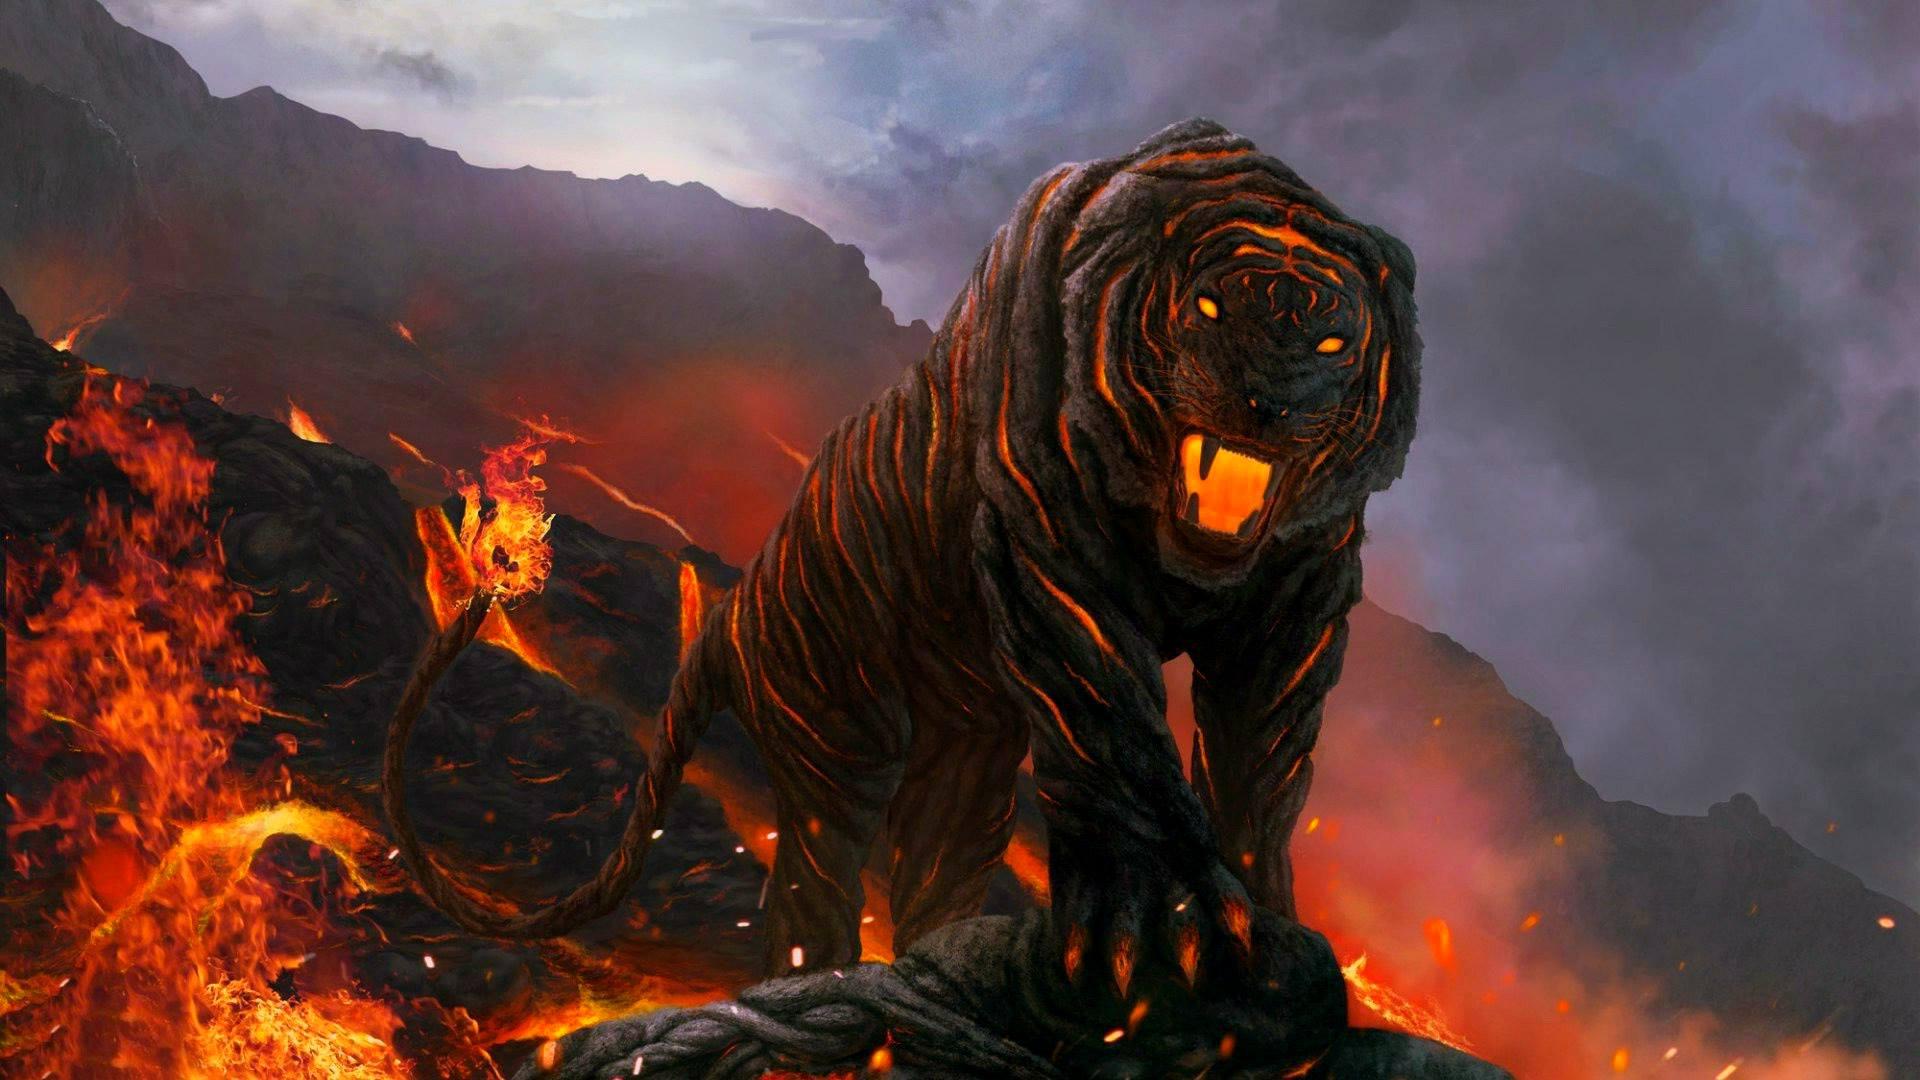 Desktop Hd Tiger Attack Pics: Tiger Wallpapers, Pictures, Images